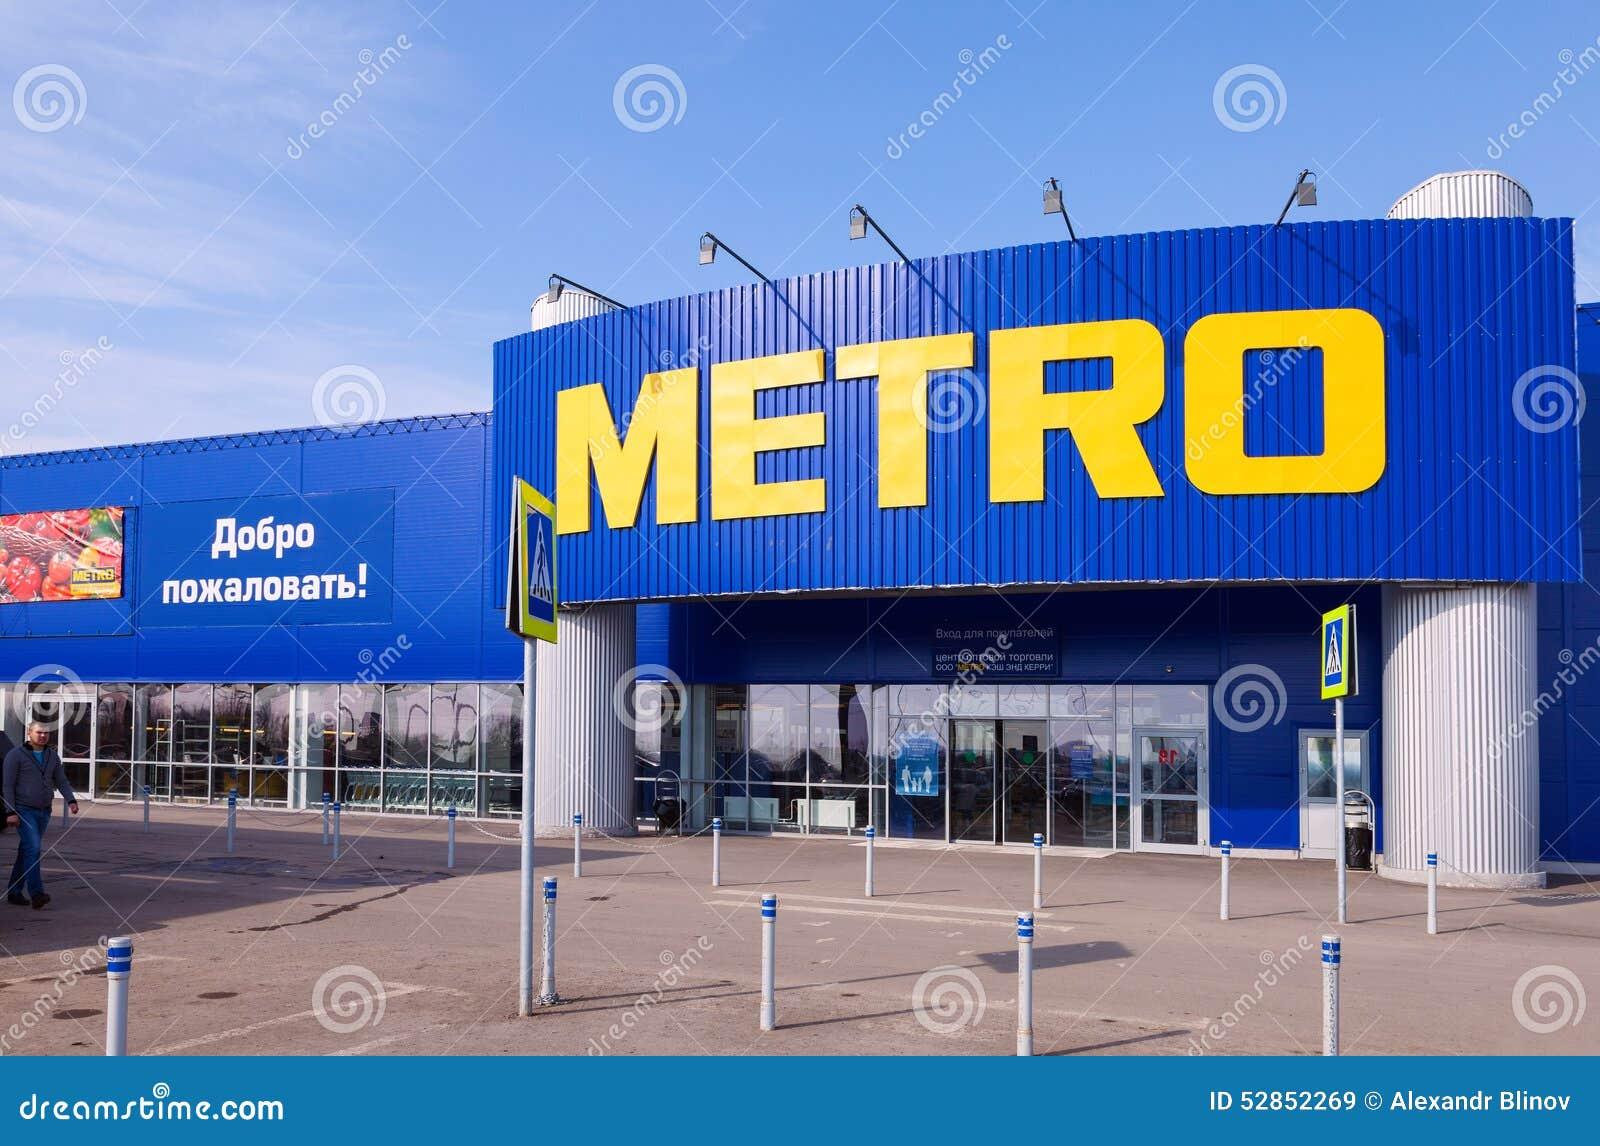 METRO Cash & Carry Samara Store. Metro Group is a German global